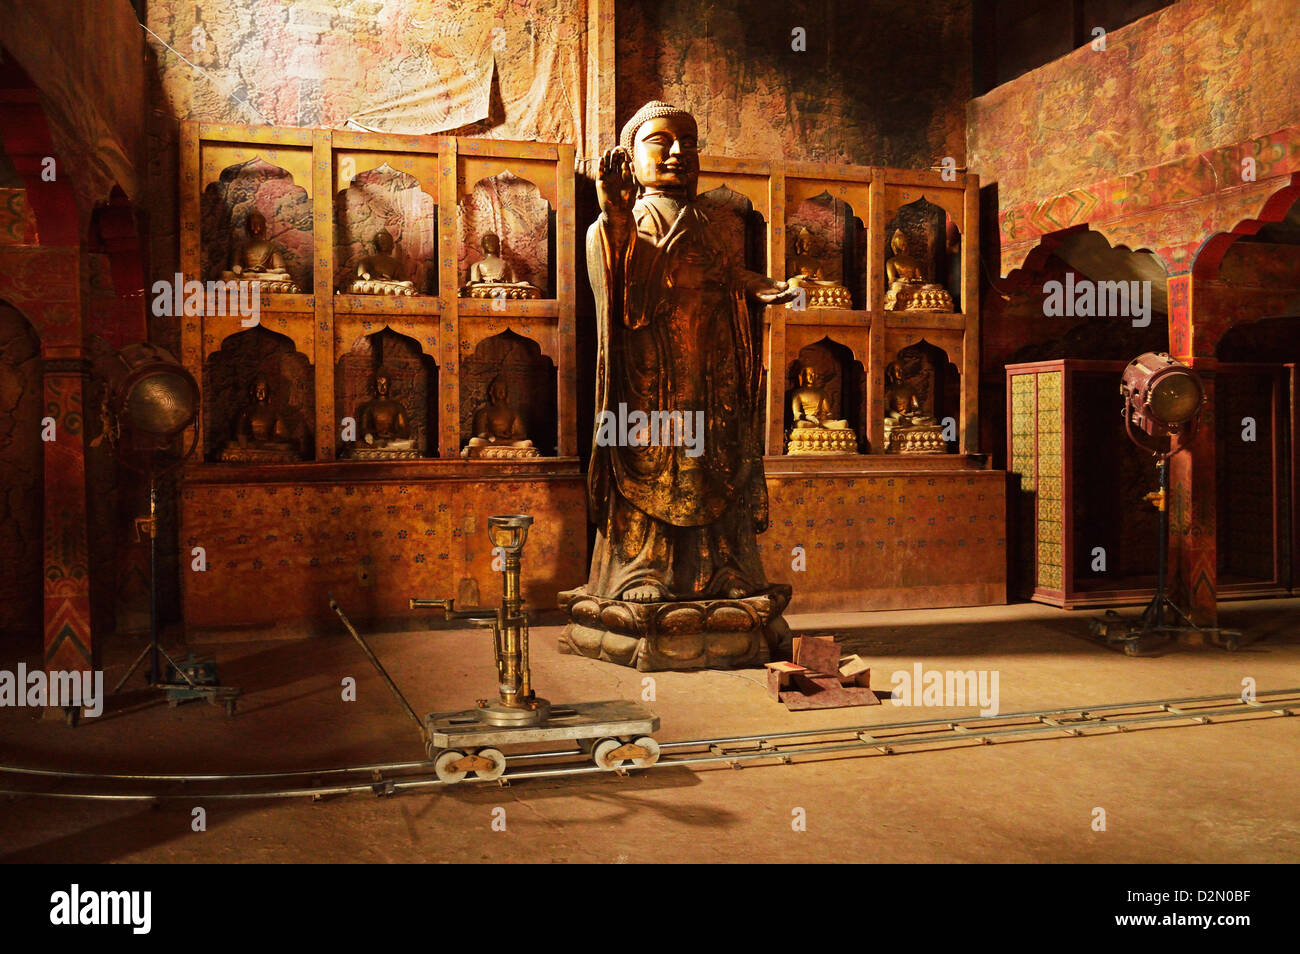 Movie set, Atlas Studios, Ouarzazate, Morocco, North Africa, Africa - Stock Image